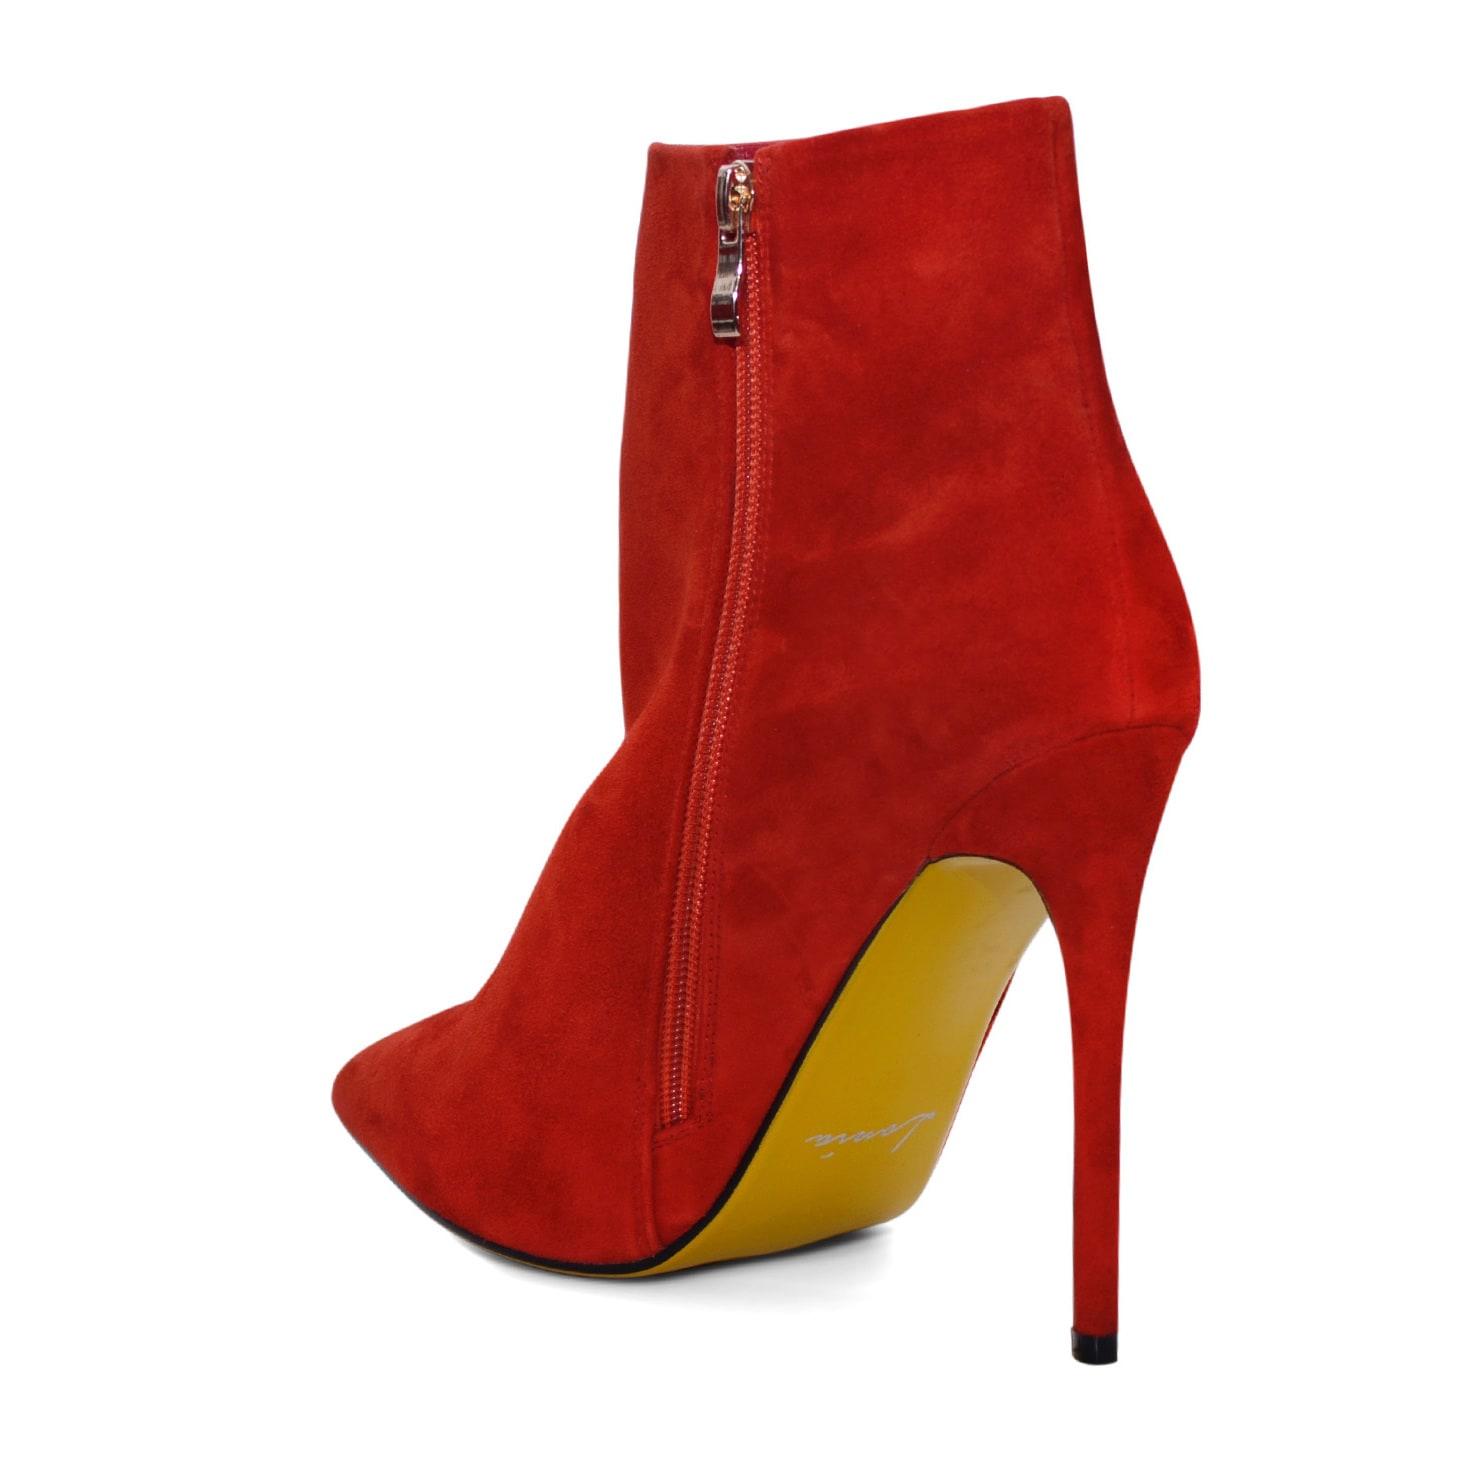 Midollo Scimmia È fortunato  Shop Lonia Merlow Burnt Orange Suede High-heel Ankle Boot - Overstock -  14413627